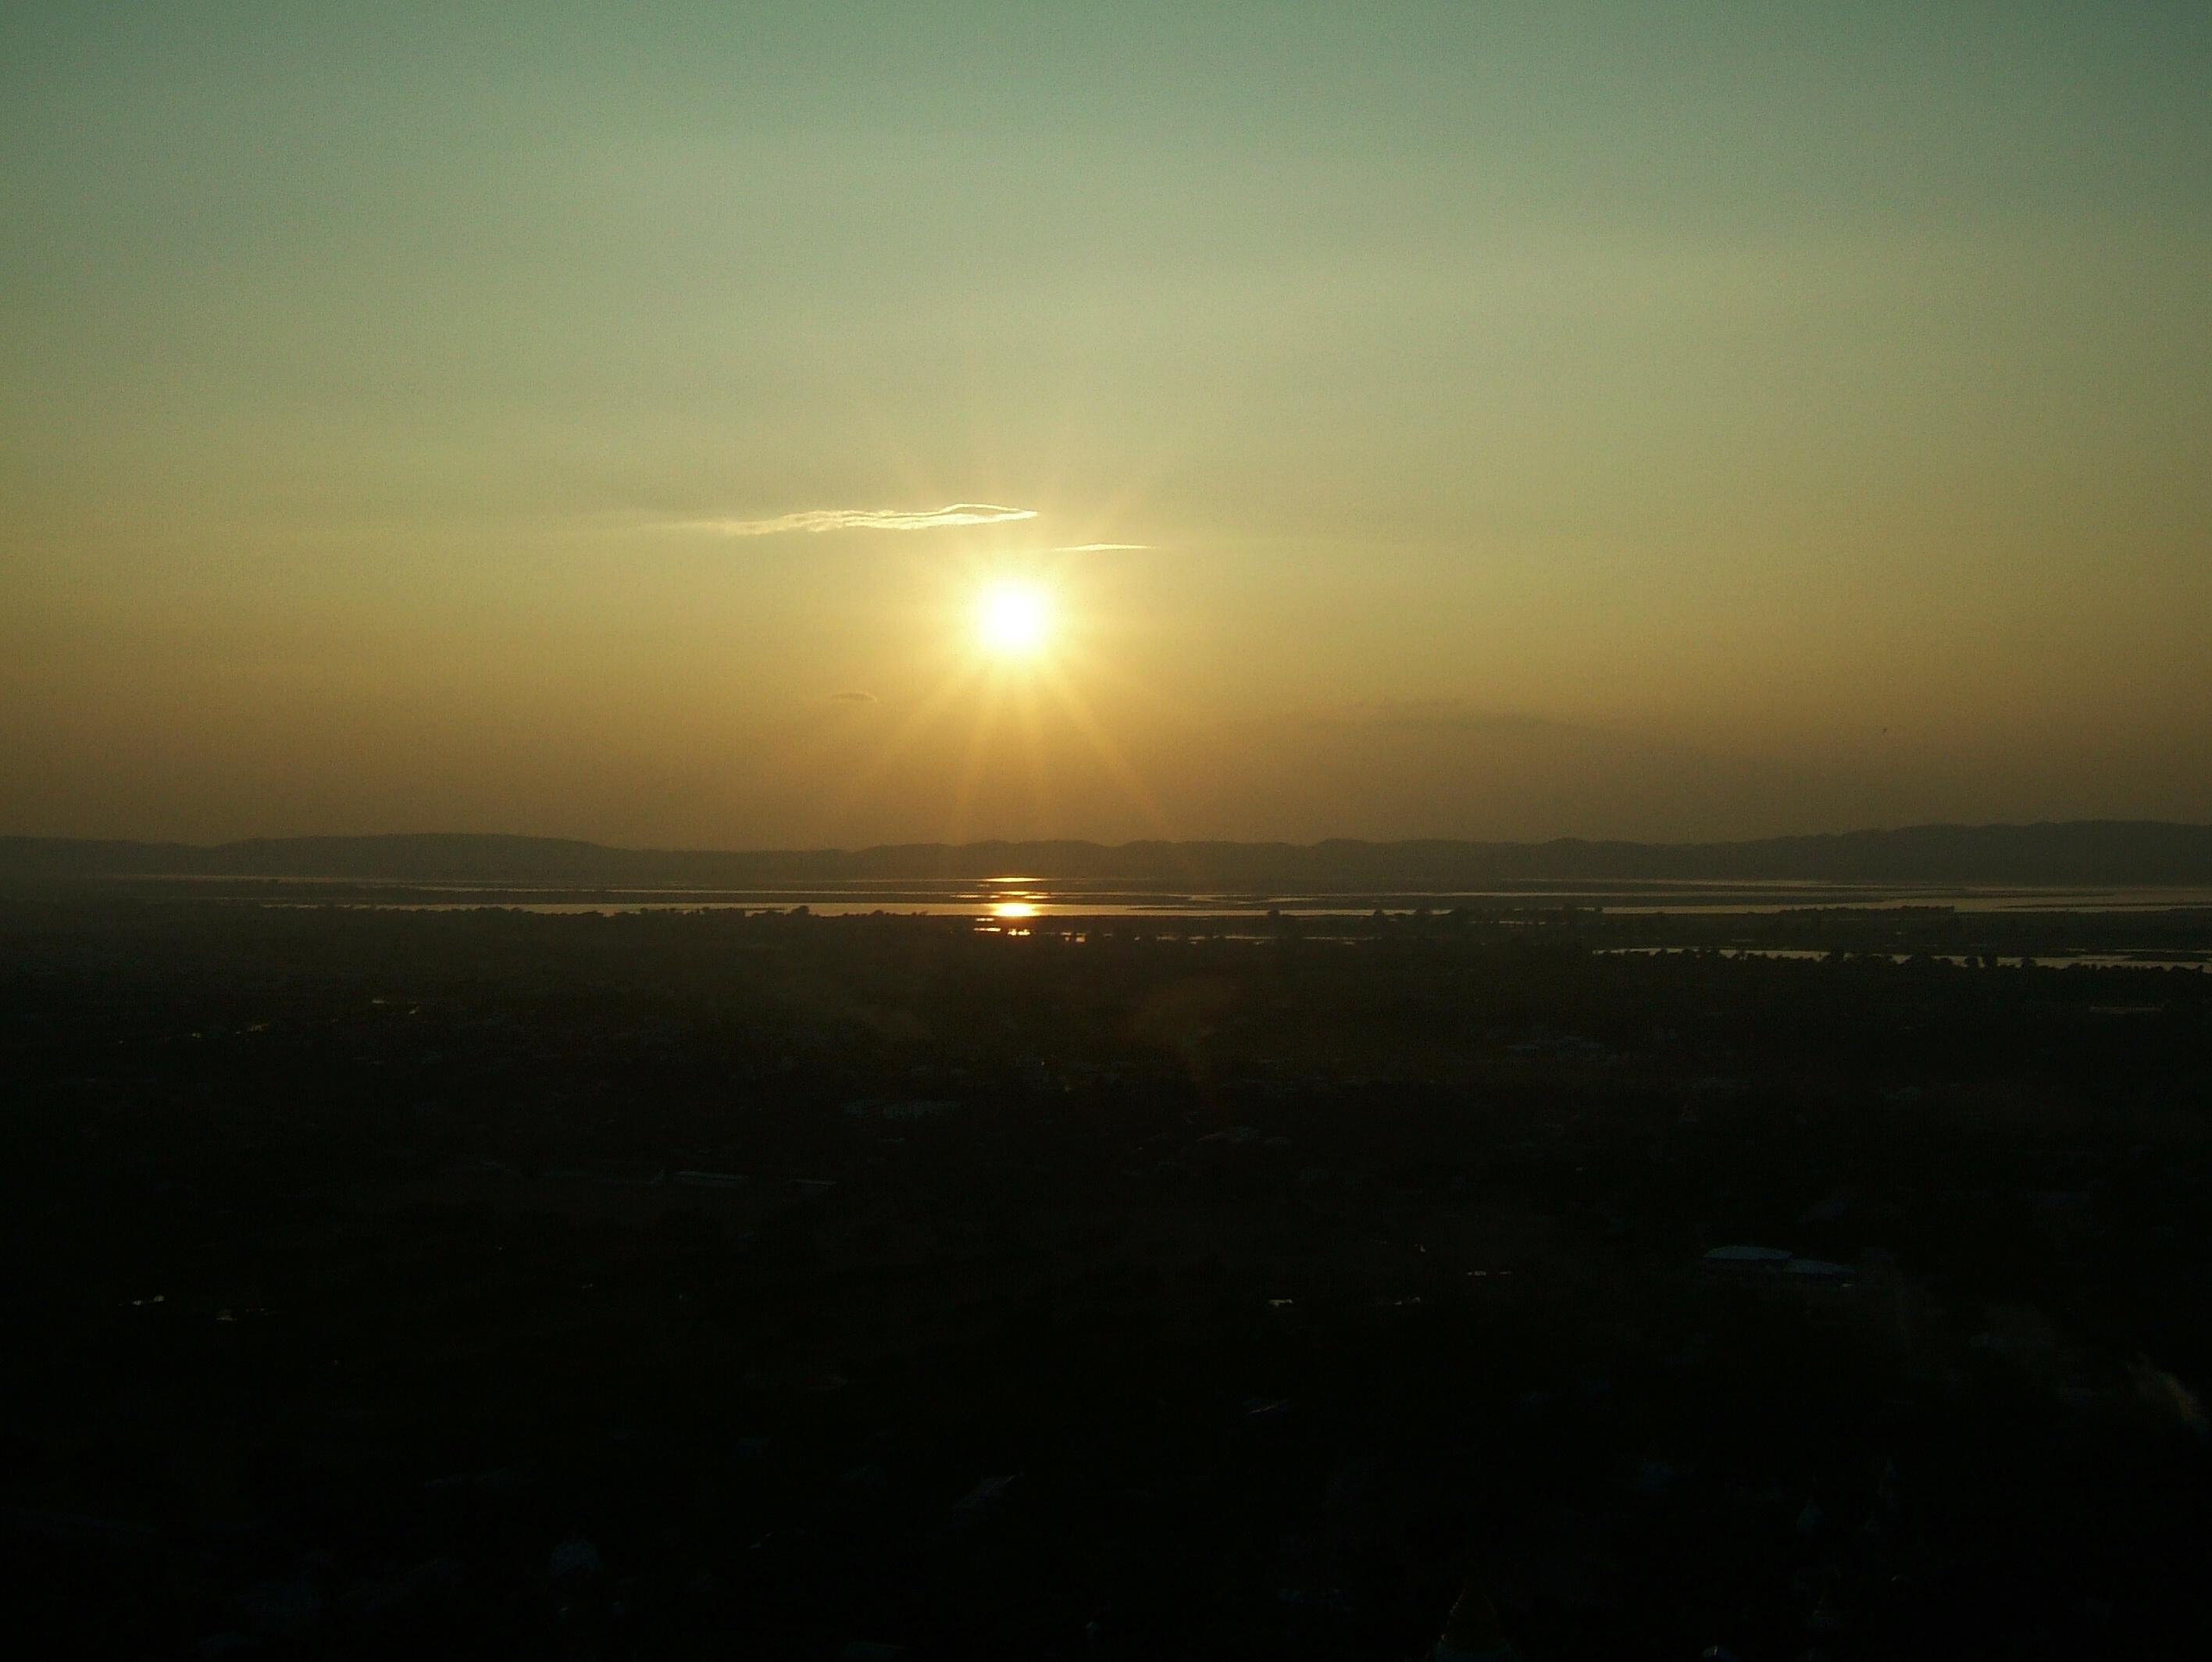 Mandalay Hill Sutaungpyei Pagoda sunset Nov 2004 01